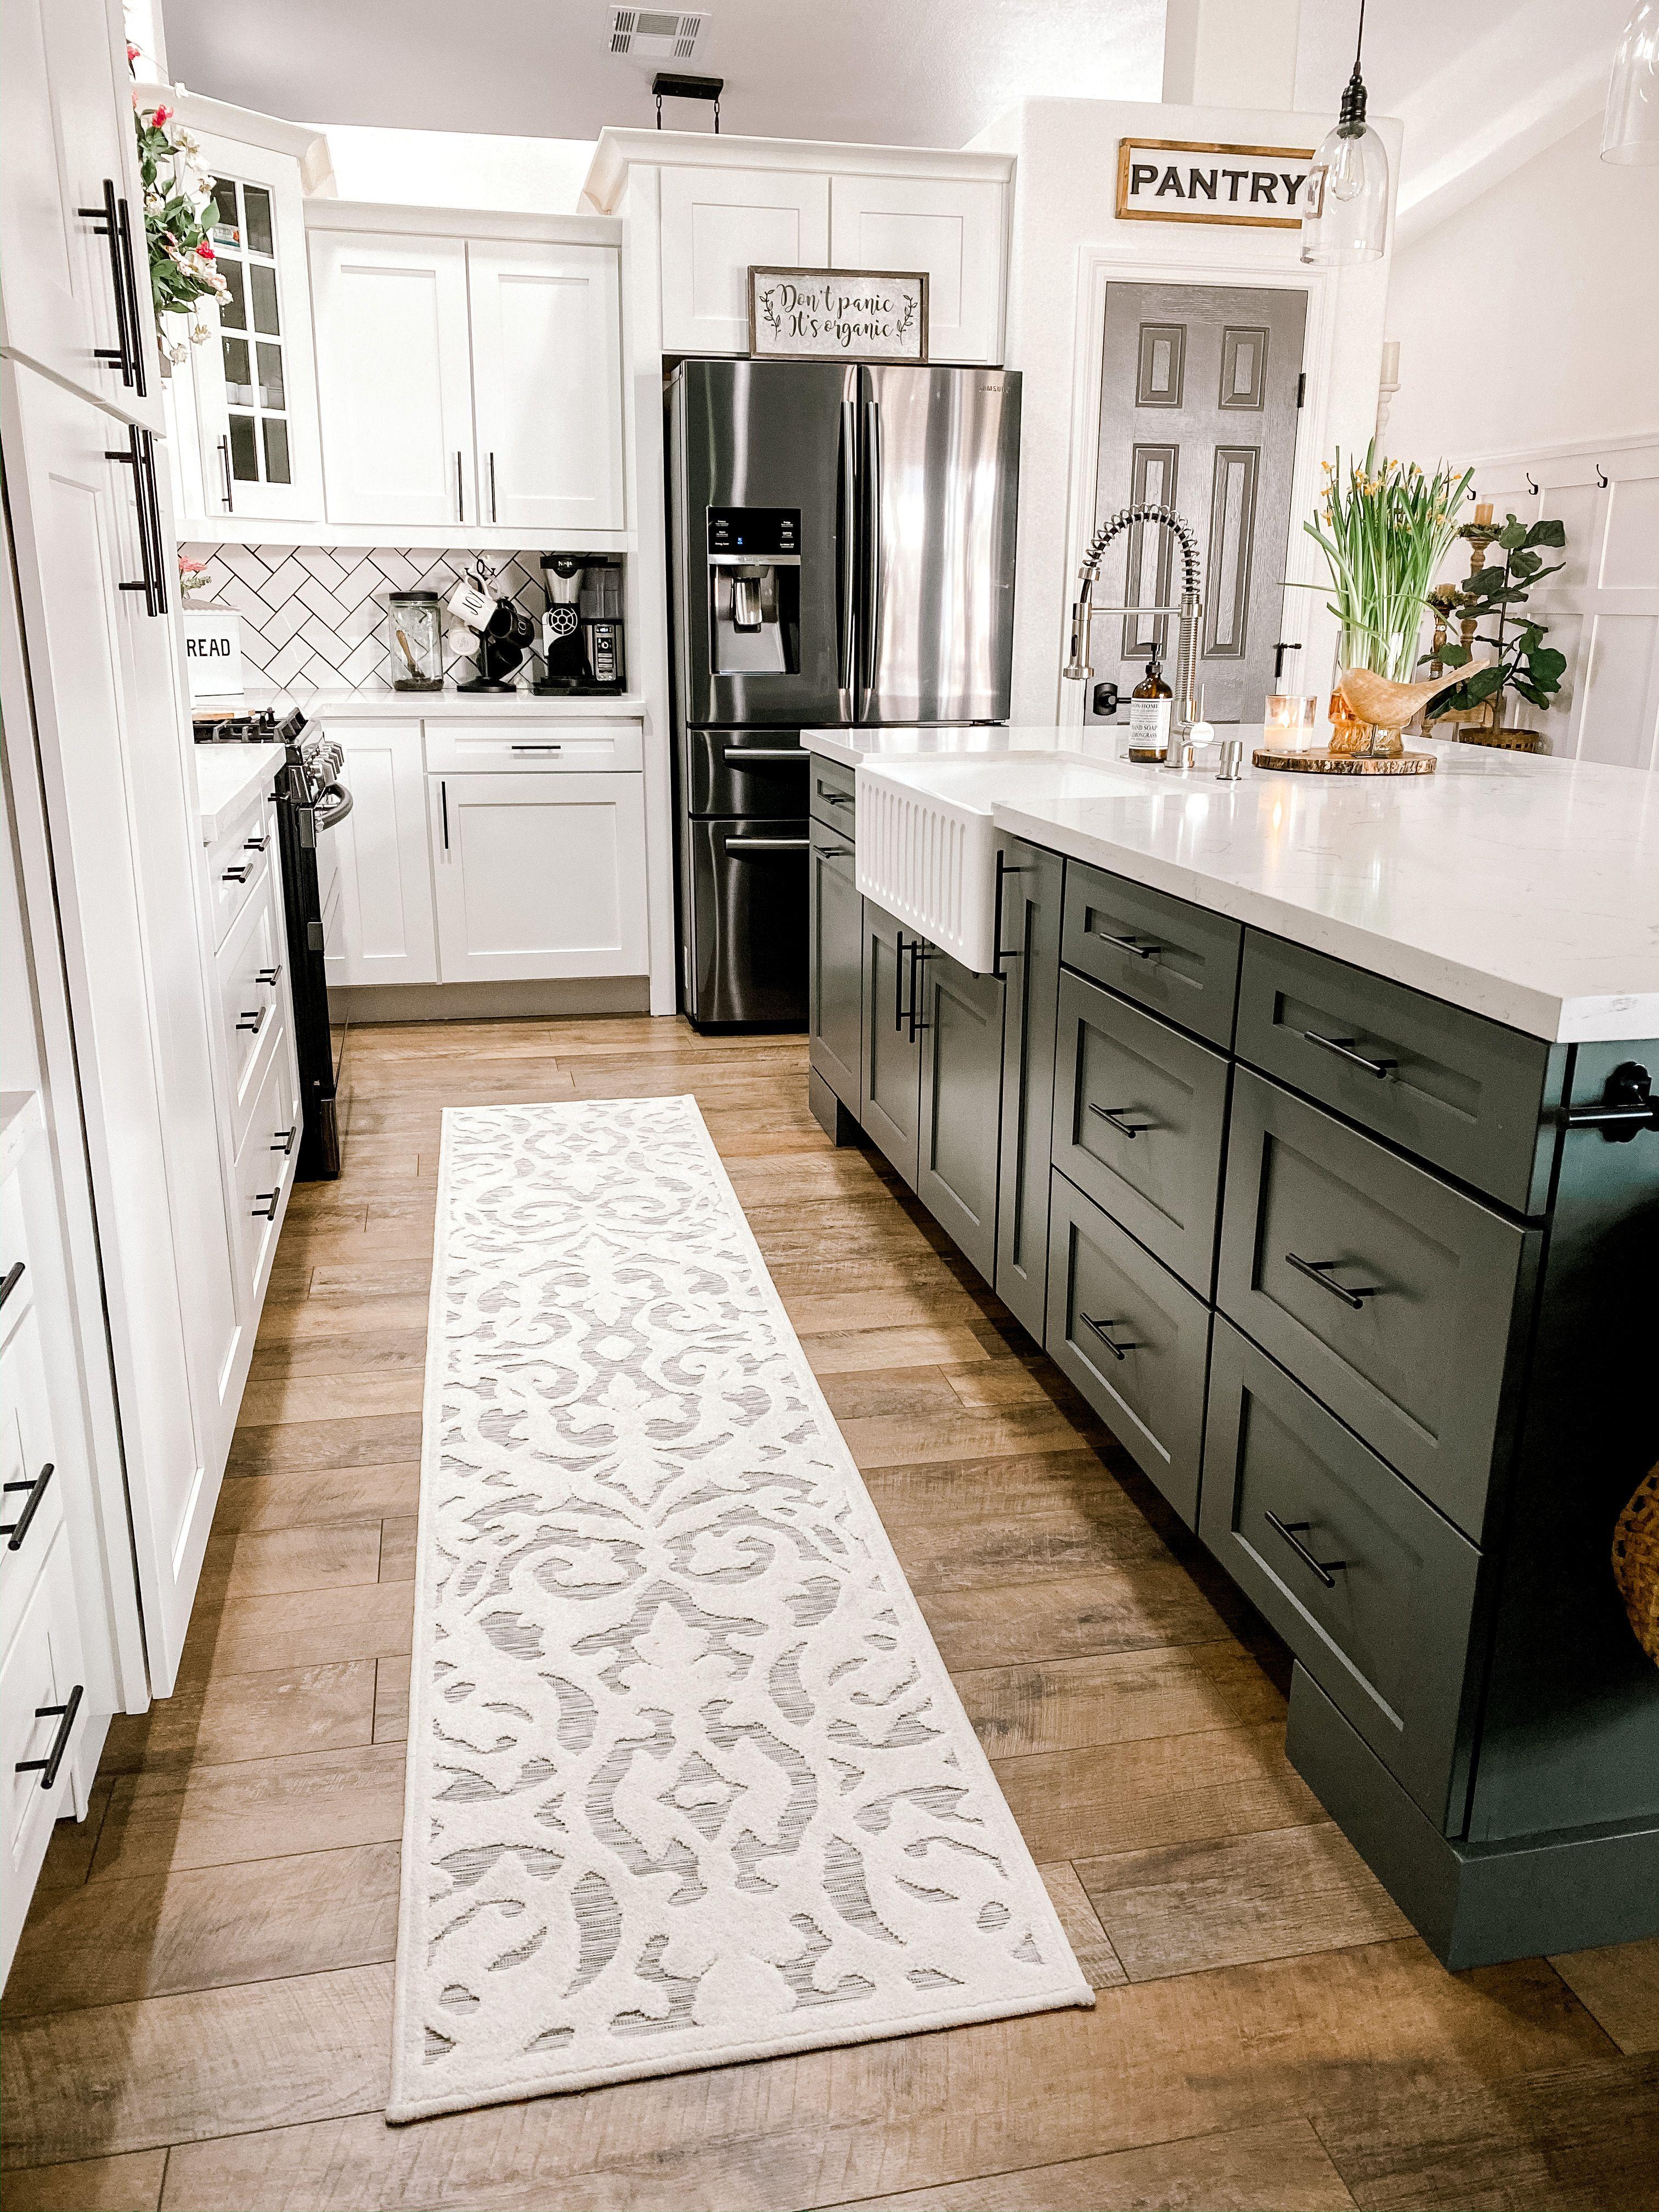 5 Stylish Kitchen Runners Stylish Kitchen Kitchen Runners Kitchen Runner Long runner rugs for kitchen